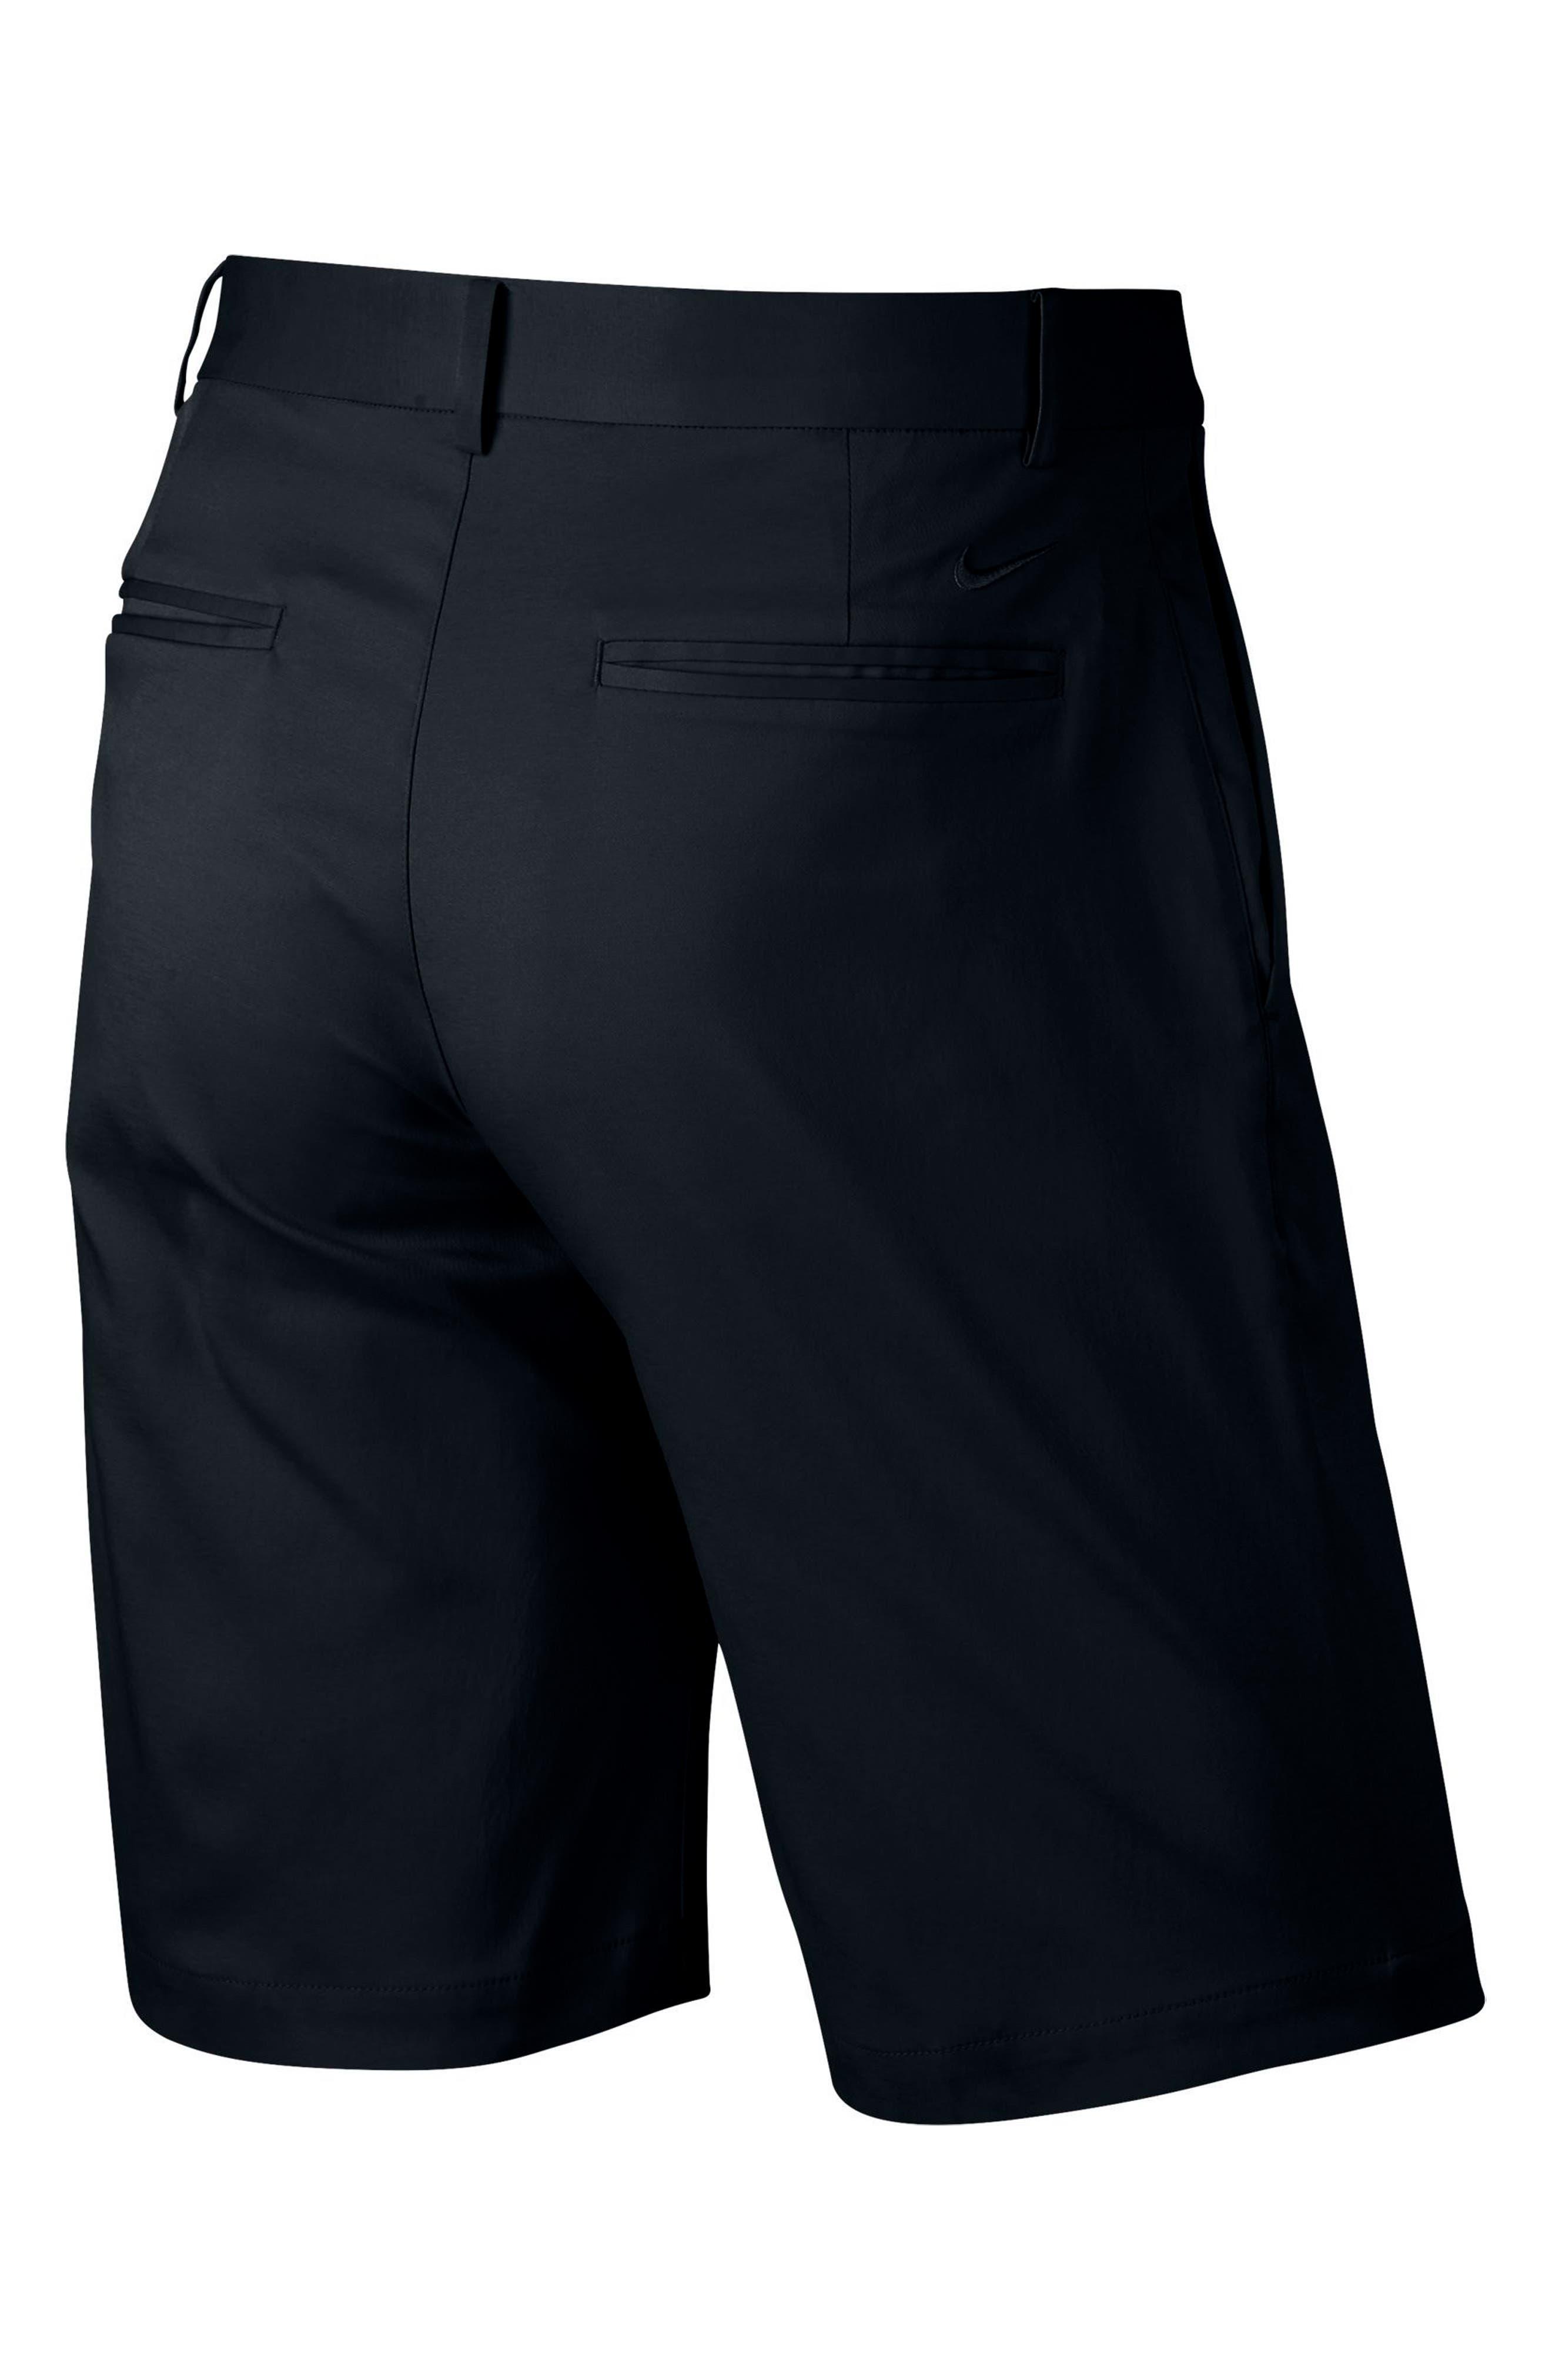 Flat Front Golf Shorts,                             Alternate thumbnail 56, color,